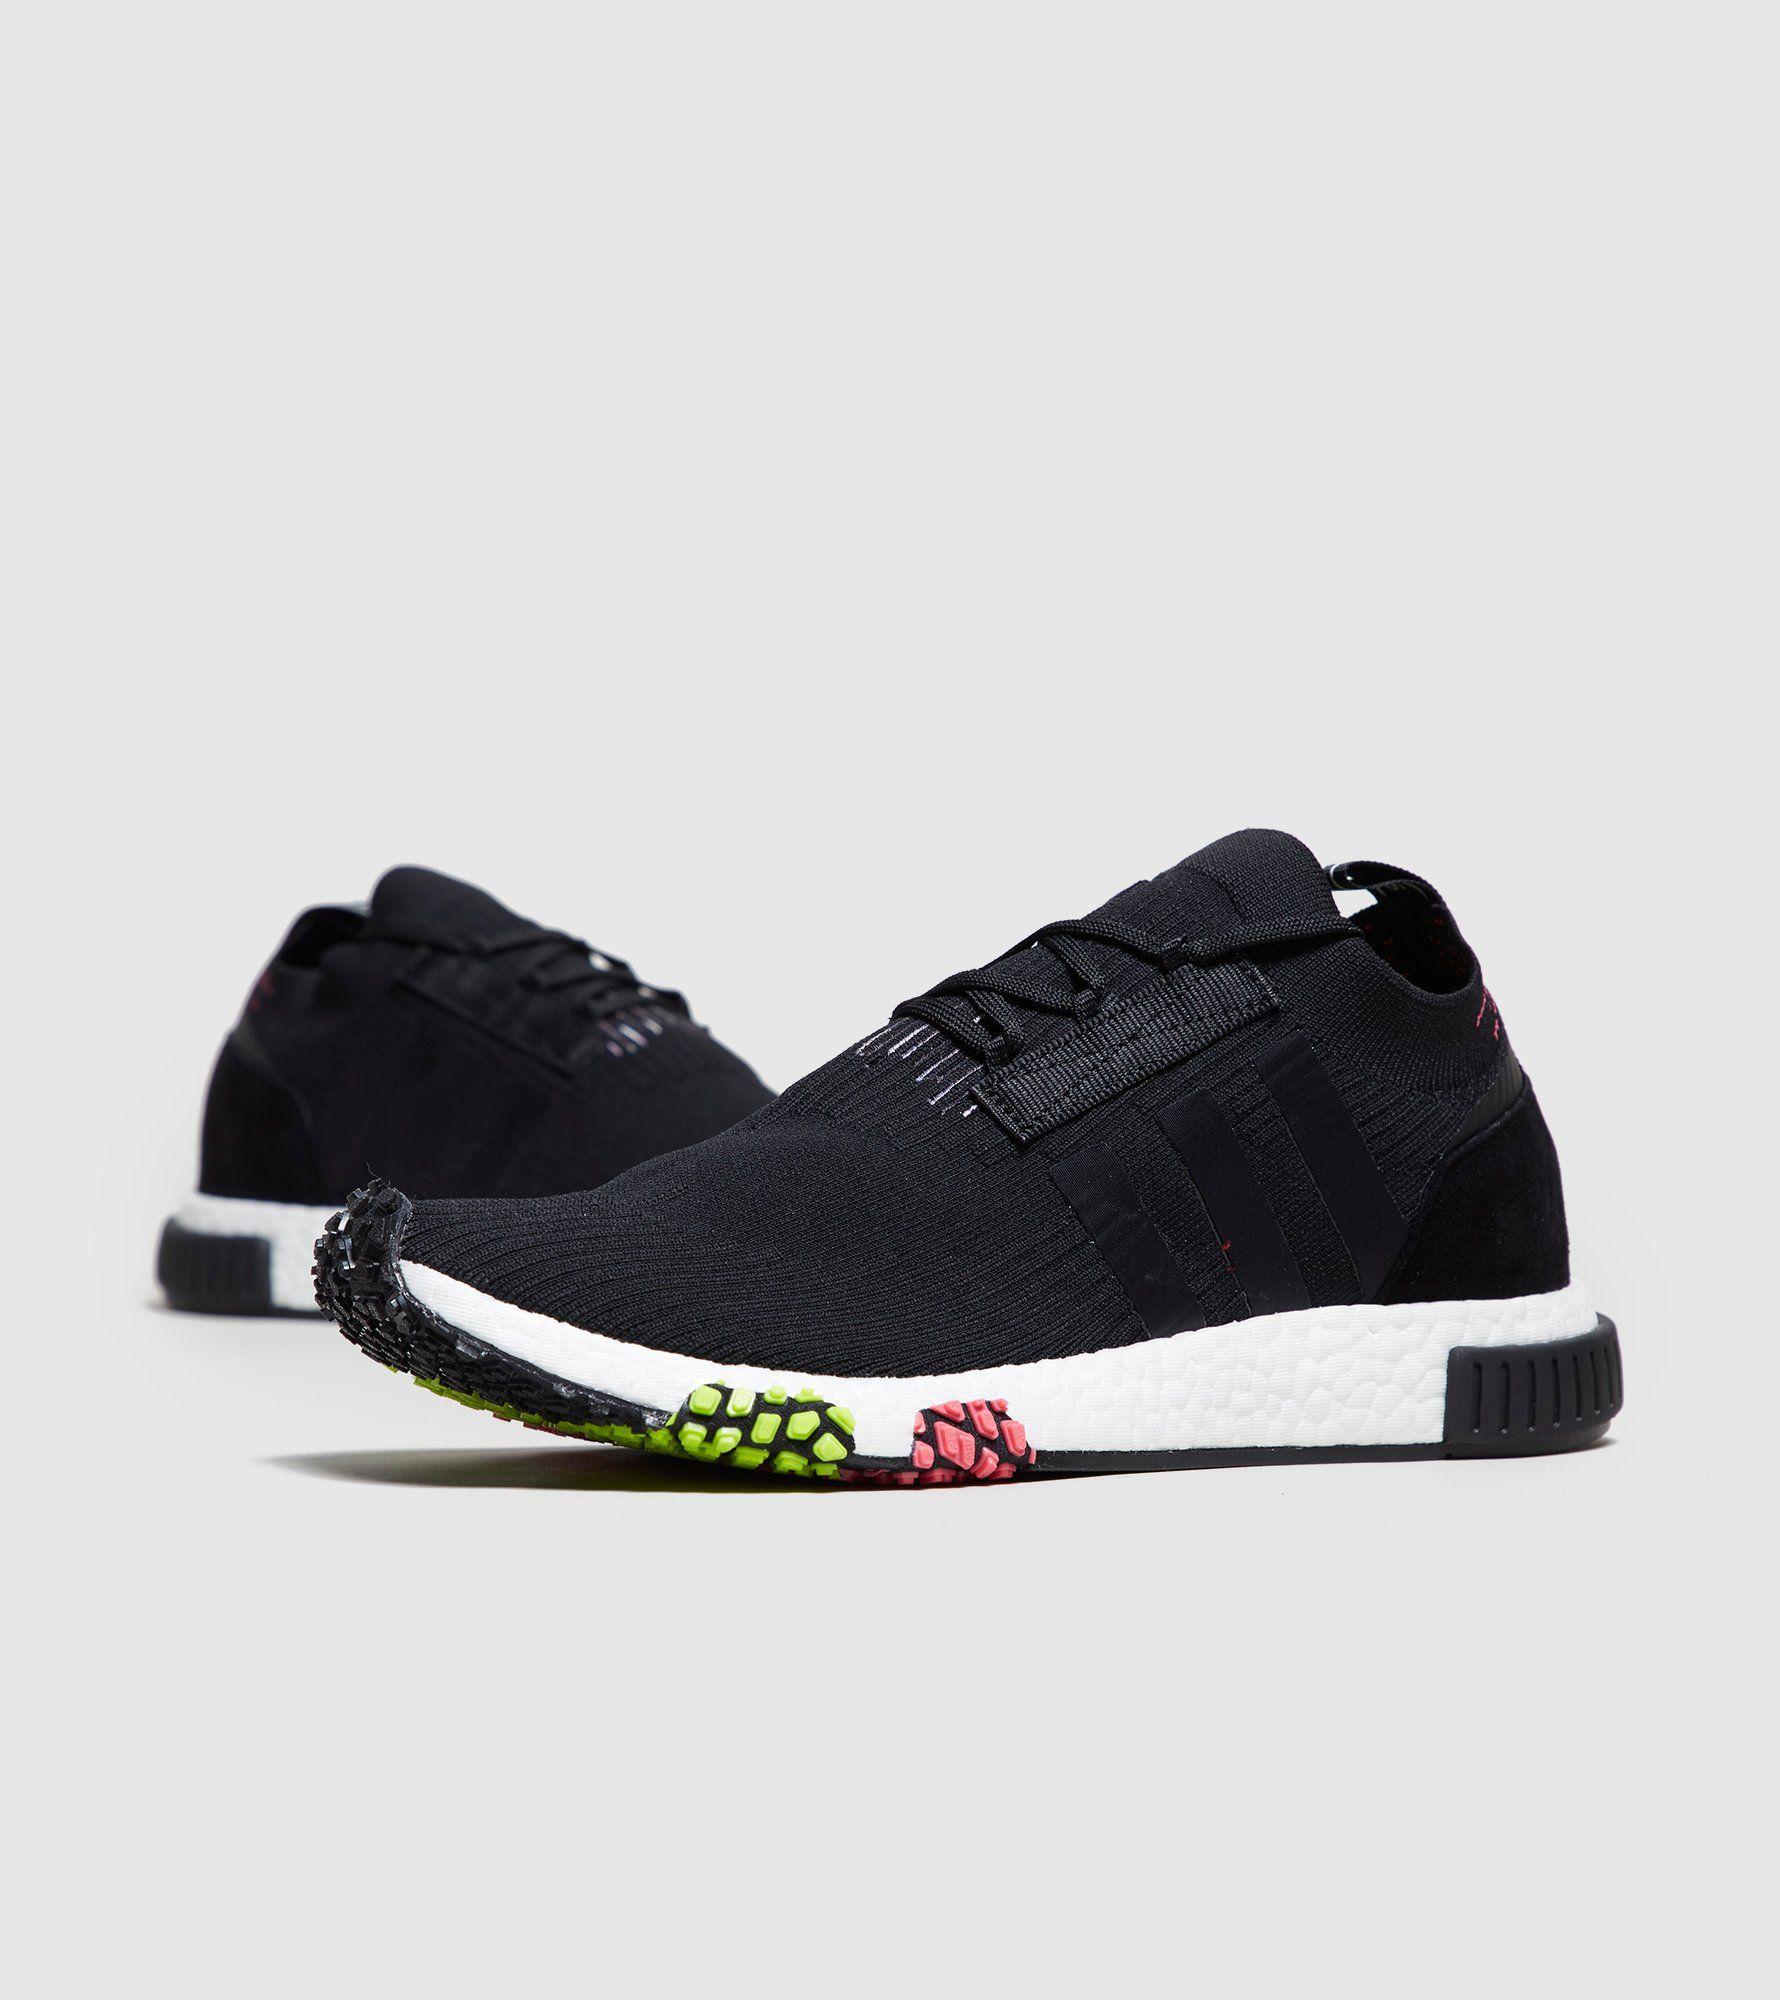 Black NMD Racer Primeknit sneaker adidas Originals